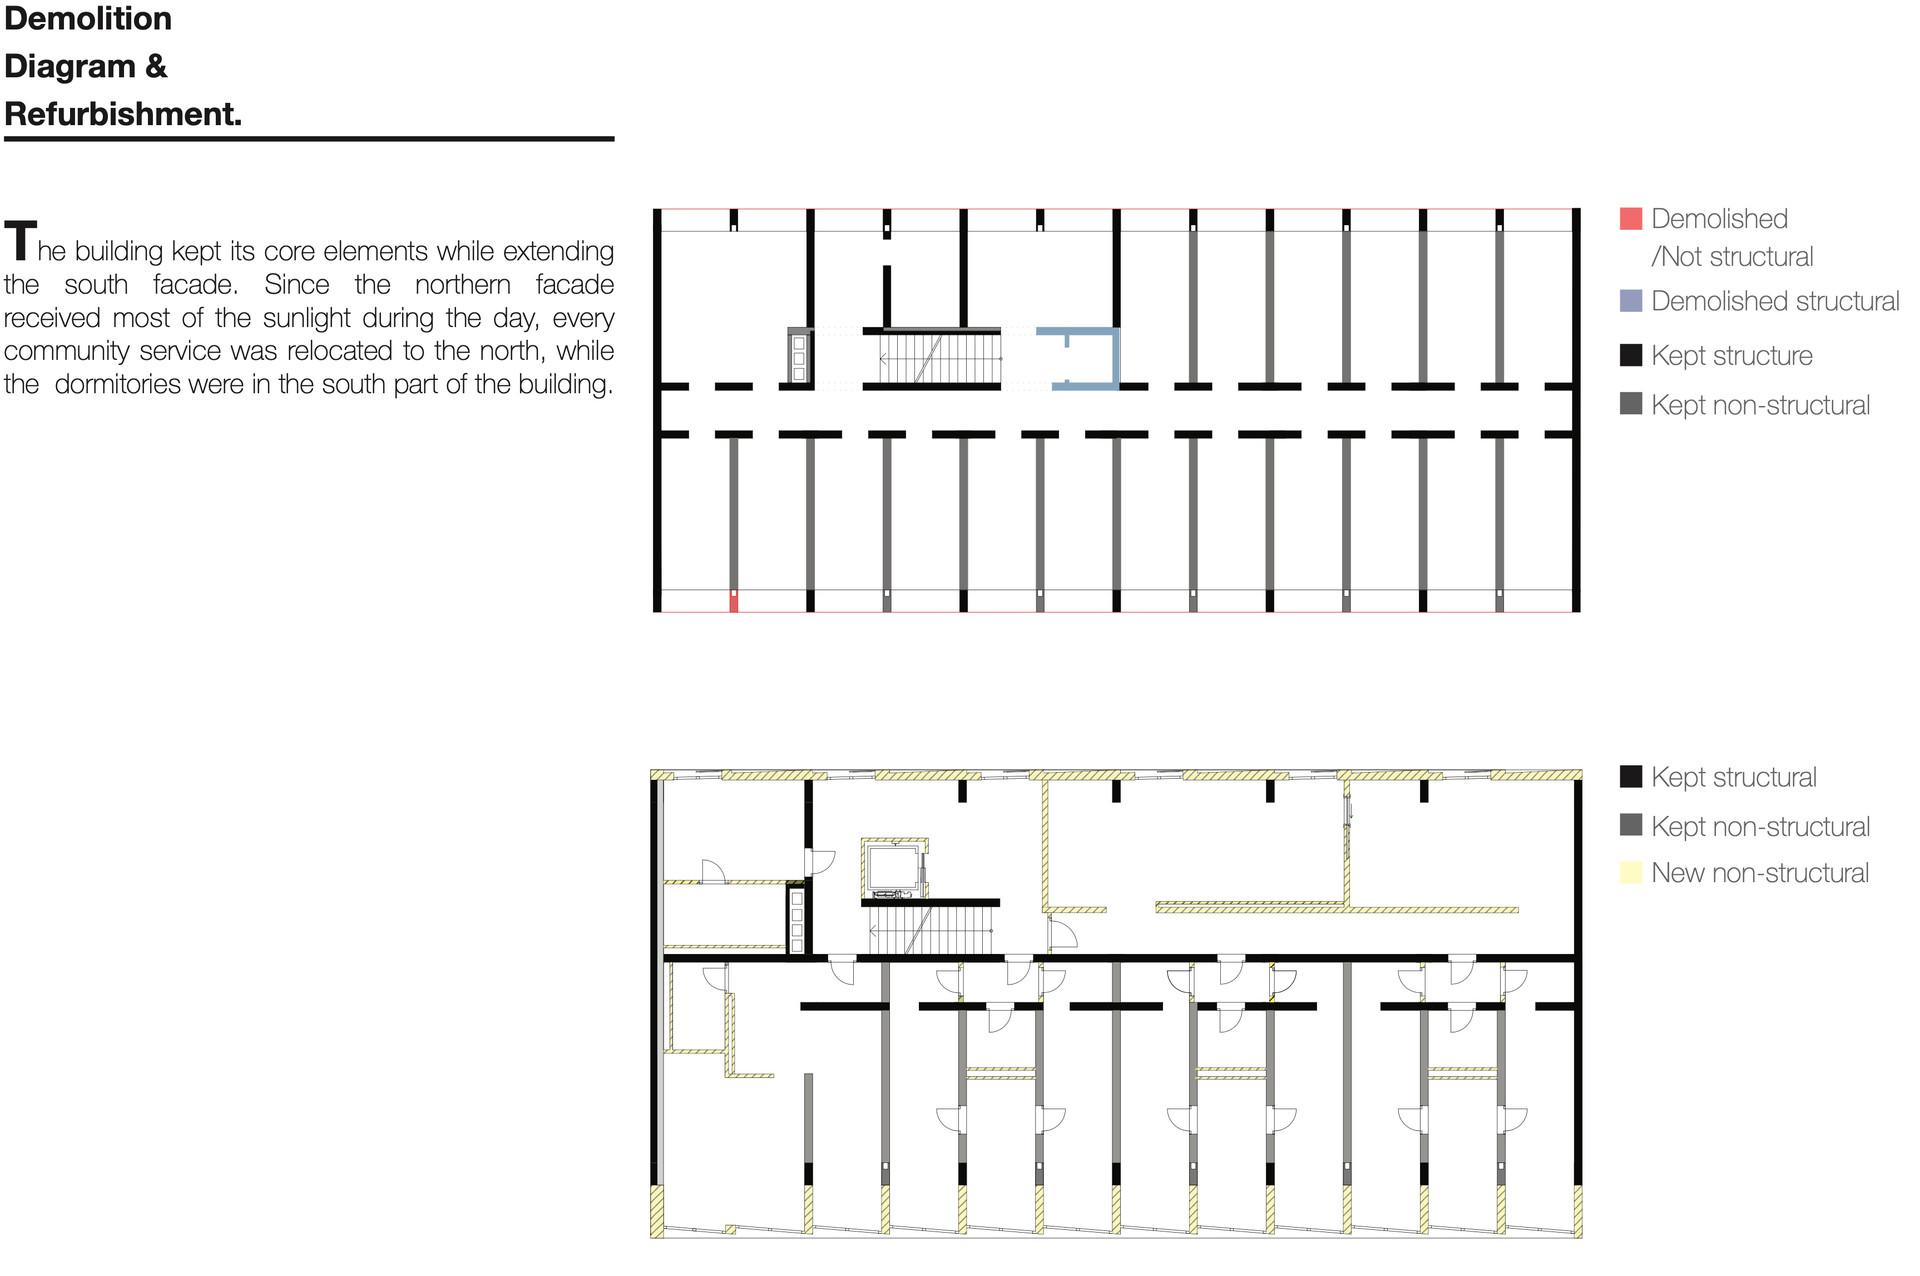 Demolition Diagram & Refurbishment.